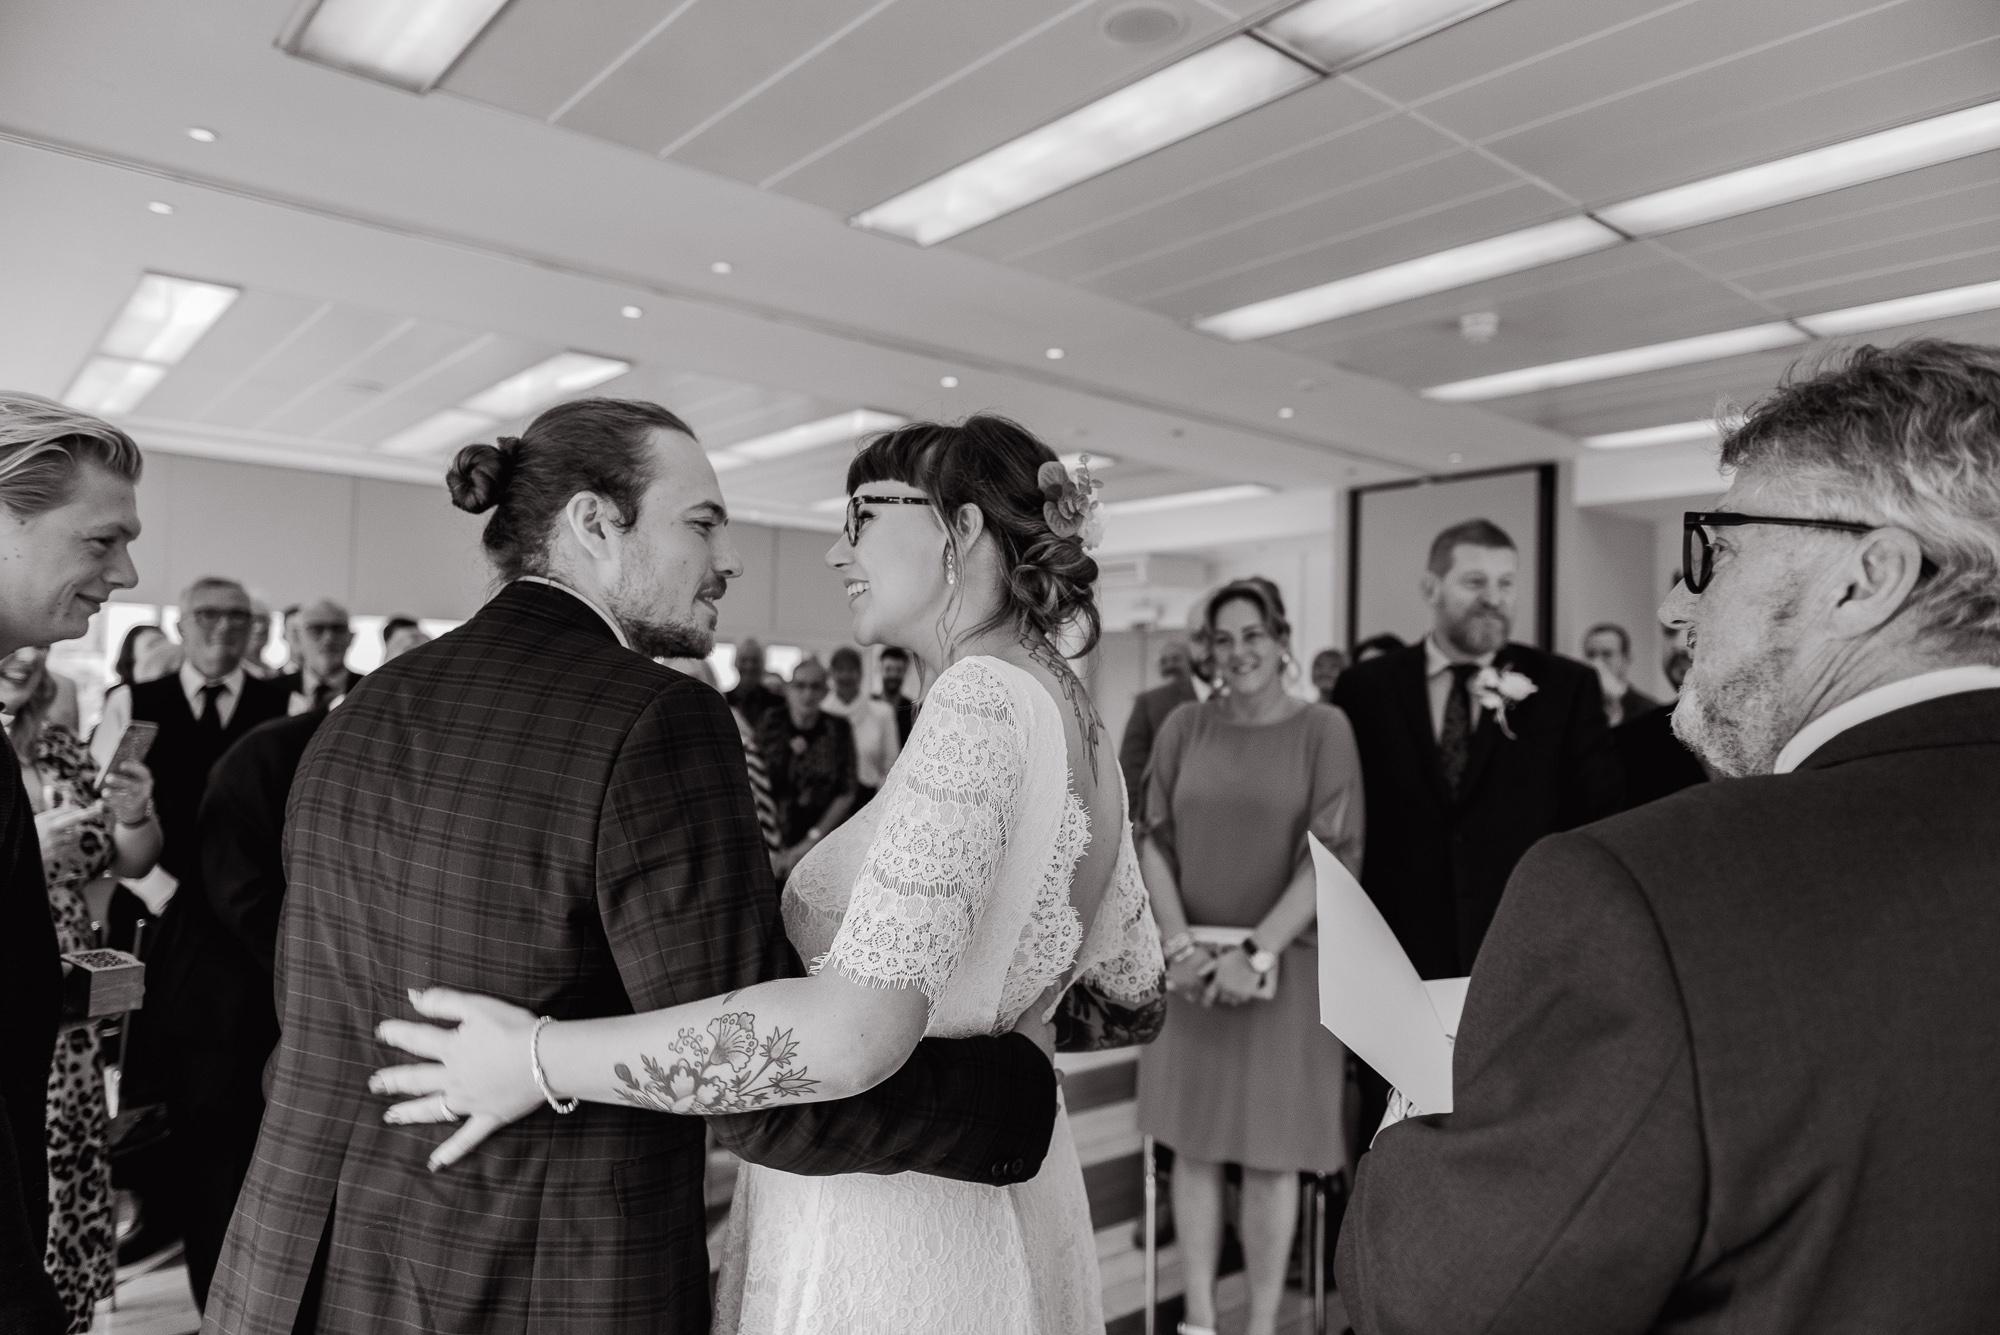 Harriet-Dahlia-Bespoke-Lace-Silk-Bohemian-Wedding-Dress-Sleeves-Tattooed-Bride-Alternative-Wedding-Sheffield-4.jpg